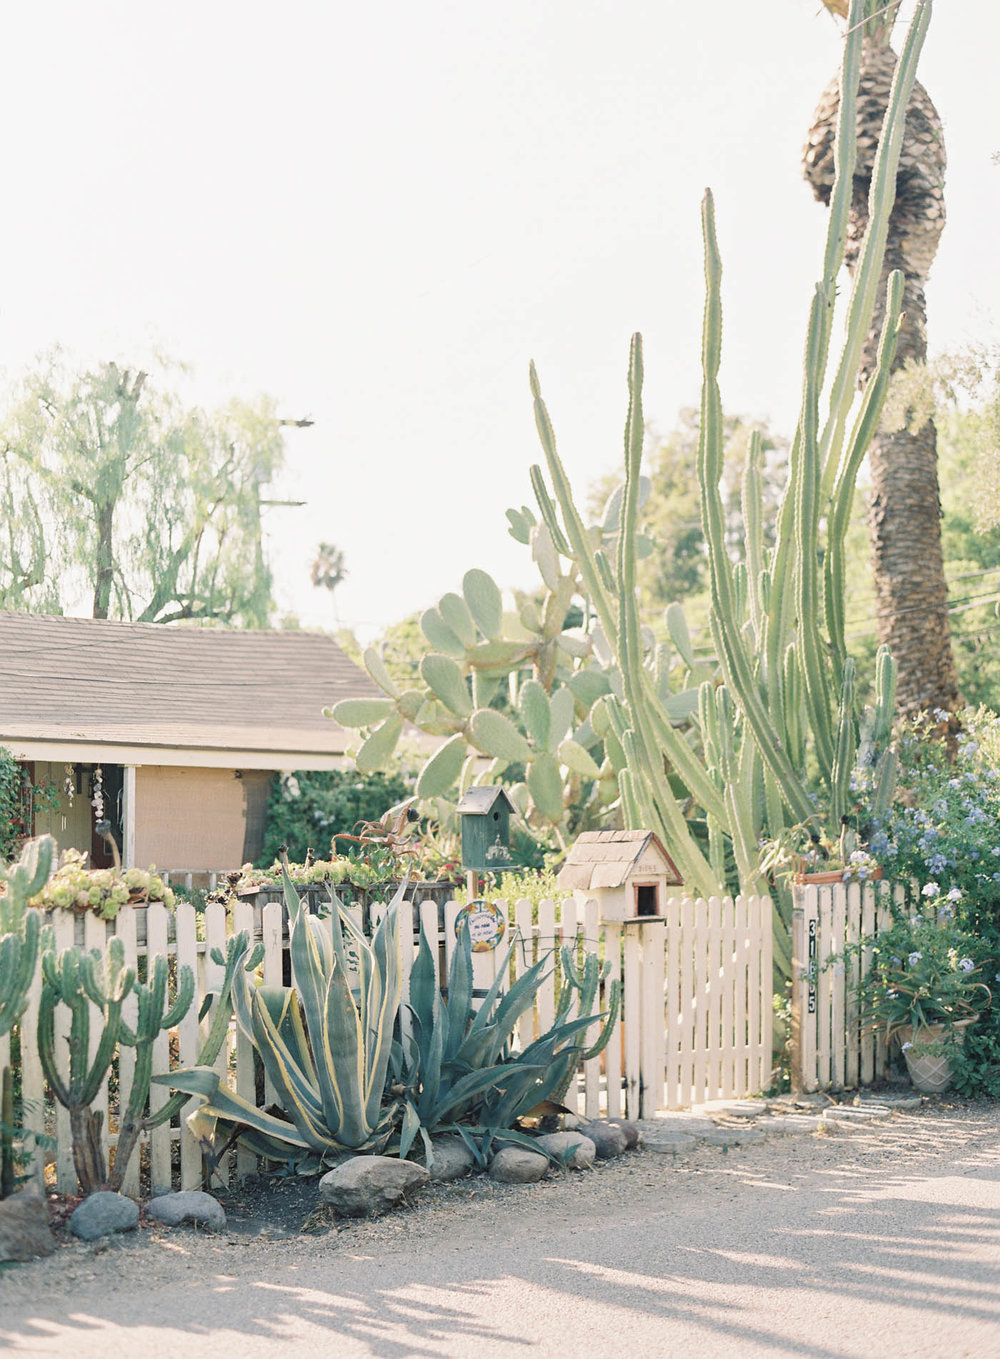 franciscan-gardens-wedding-9-Jen_Huang-000754-R1-011.jpg